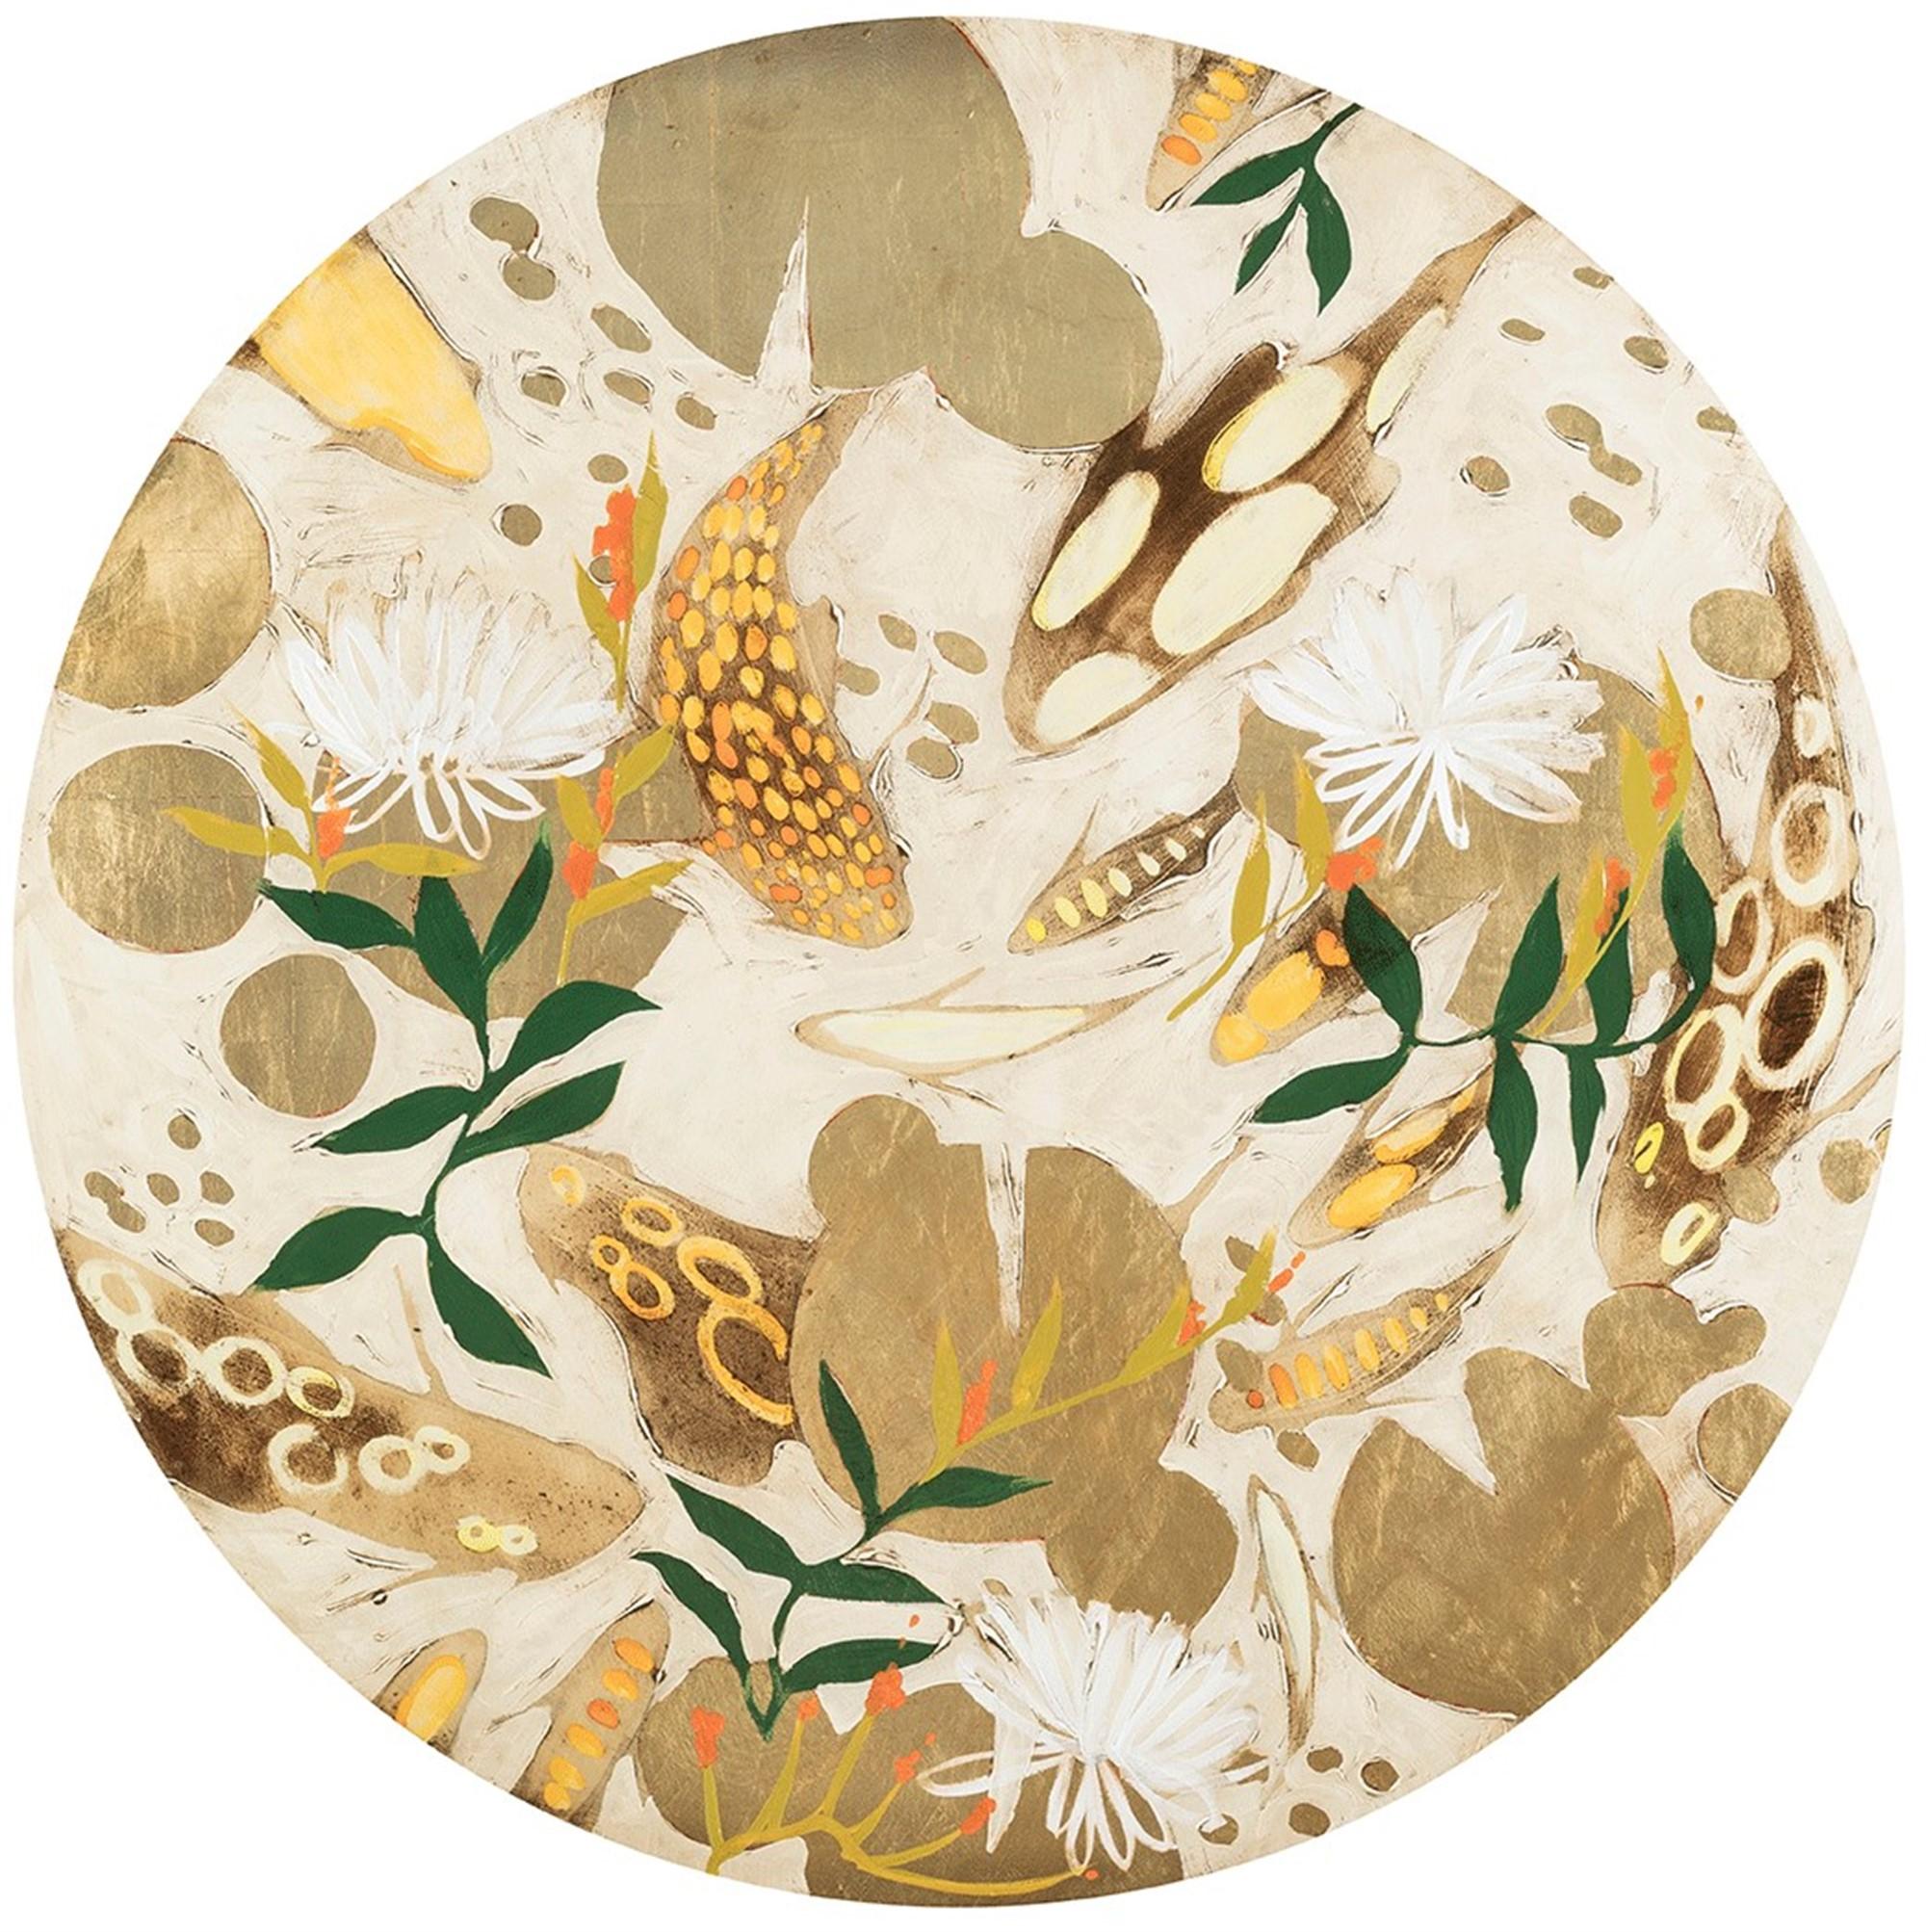 Botanicals and Koi by Joseph Bradley